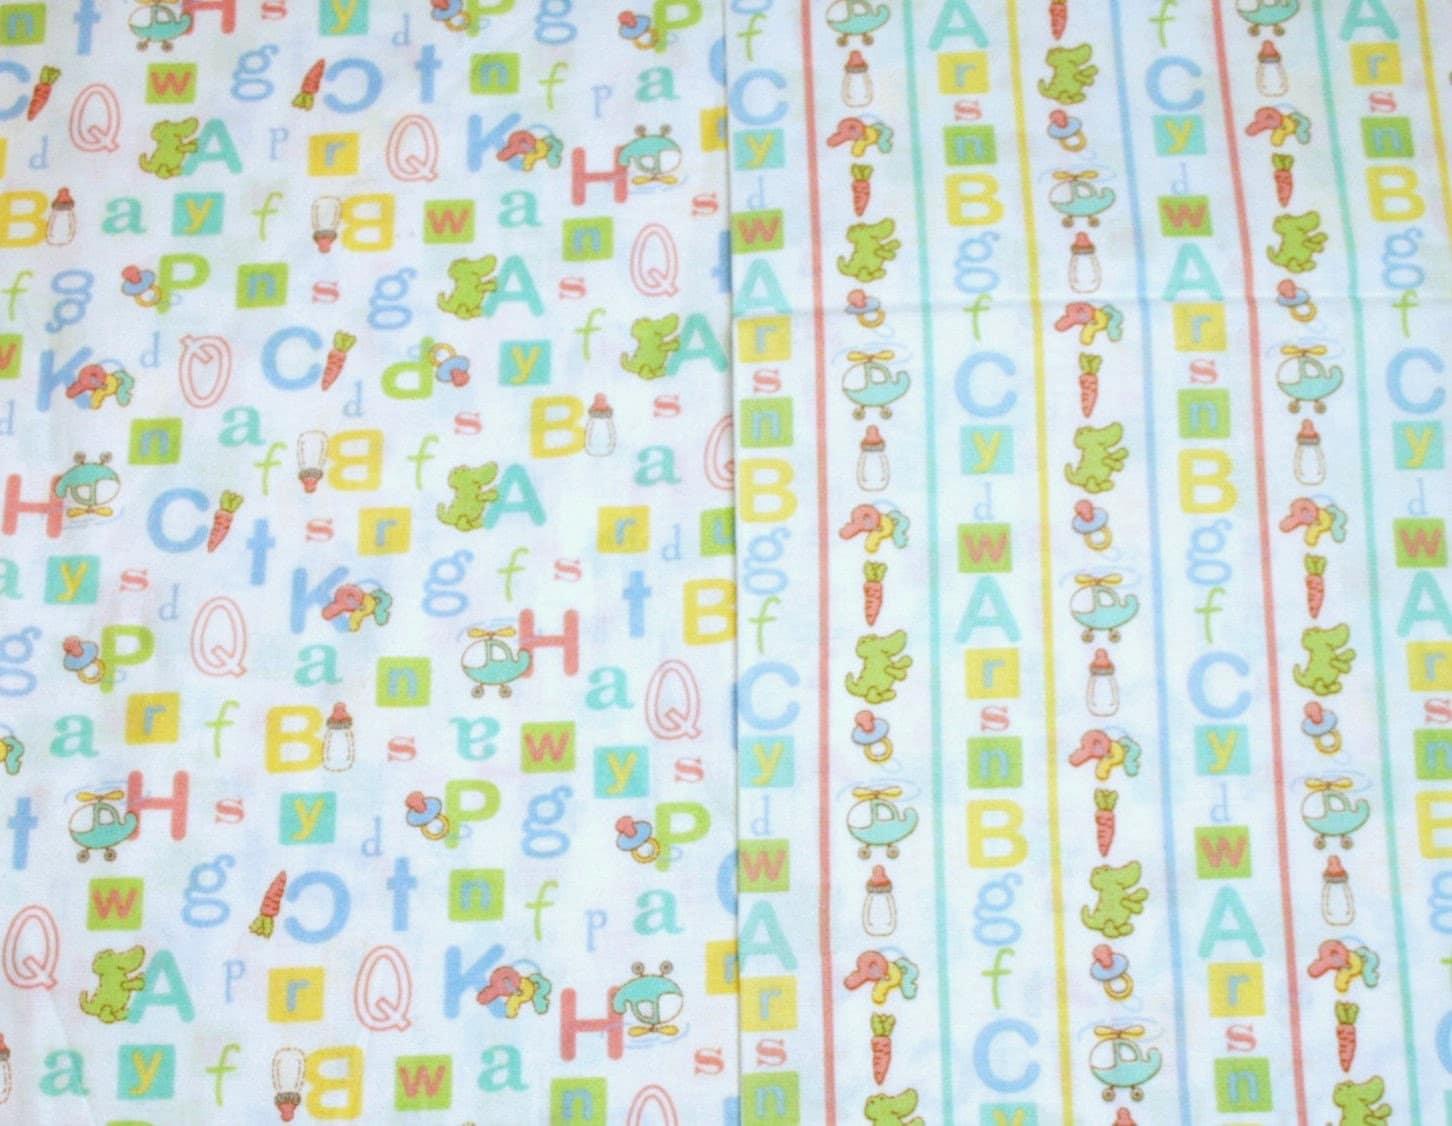 Abc nursery fabric sweet baby boy abcs oop new fabric 2 for Boy nursery fabric